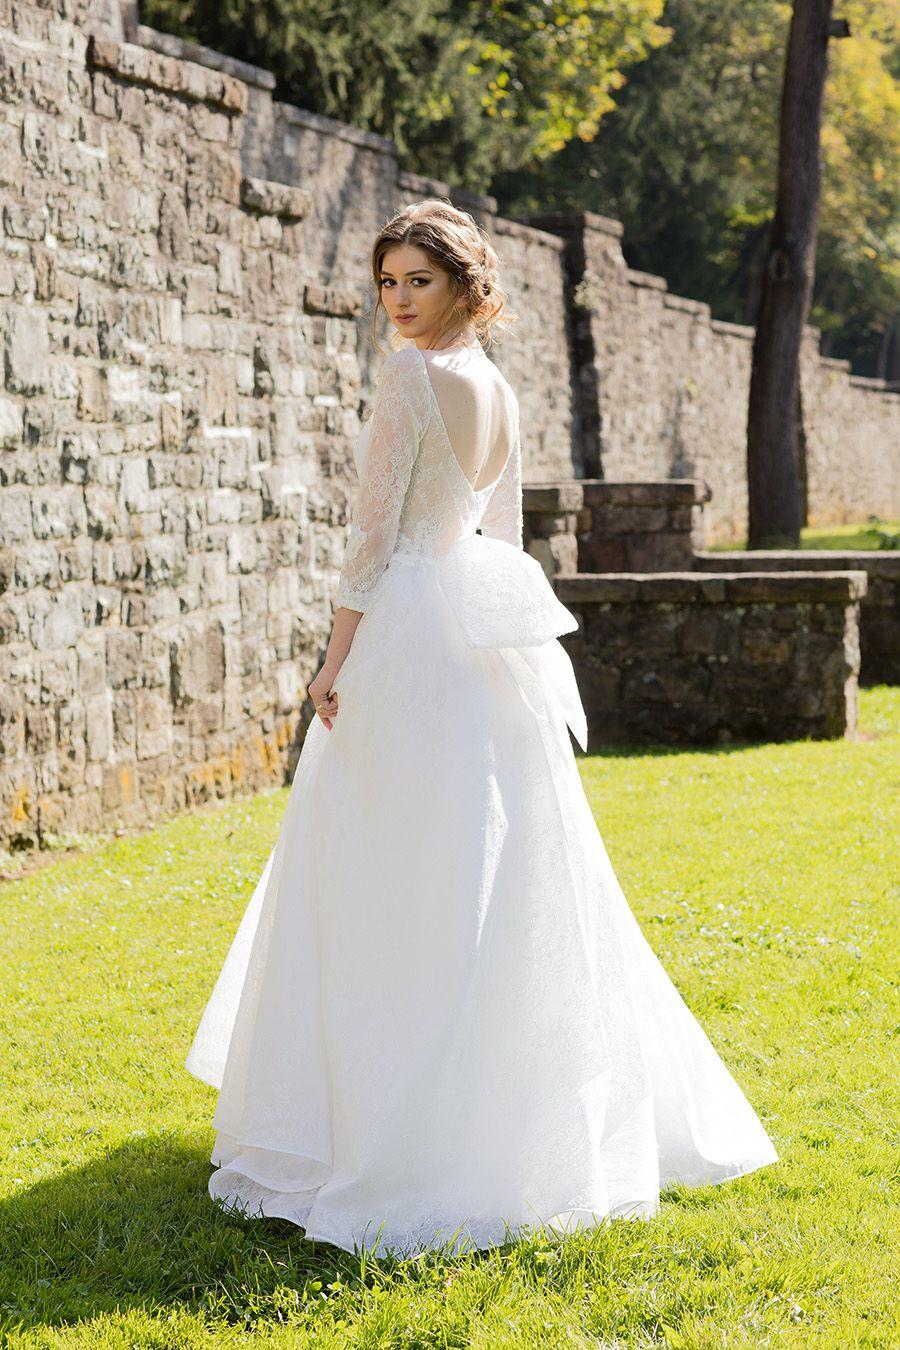 Low Back Lace Wedding Dress Barbara Kavchok 50 Shades Of Grey Fifty Shades Freed Wedding Dr Fall Wedding Dress Sleeves Bridal Fashion Week Fall Wedding Dresses [ 1350 x 900 Pixel ]